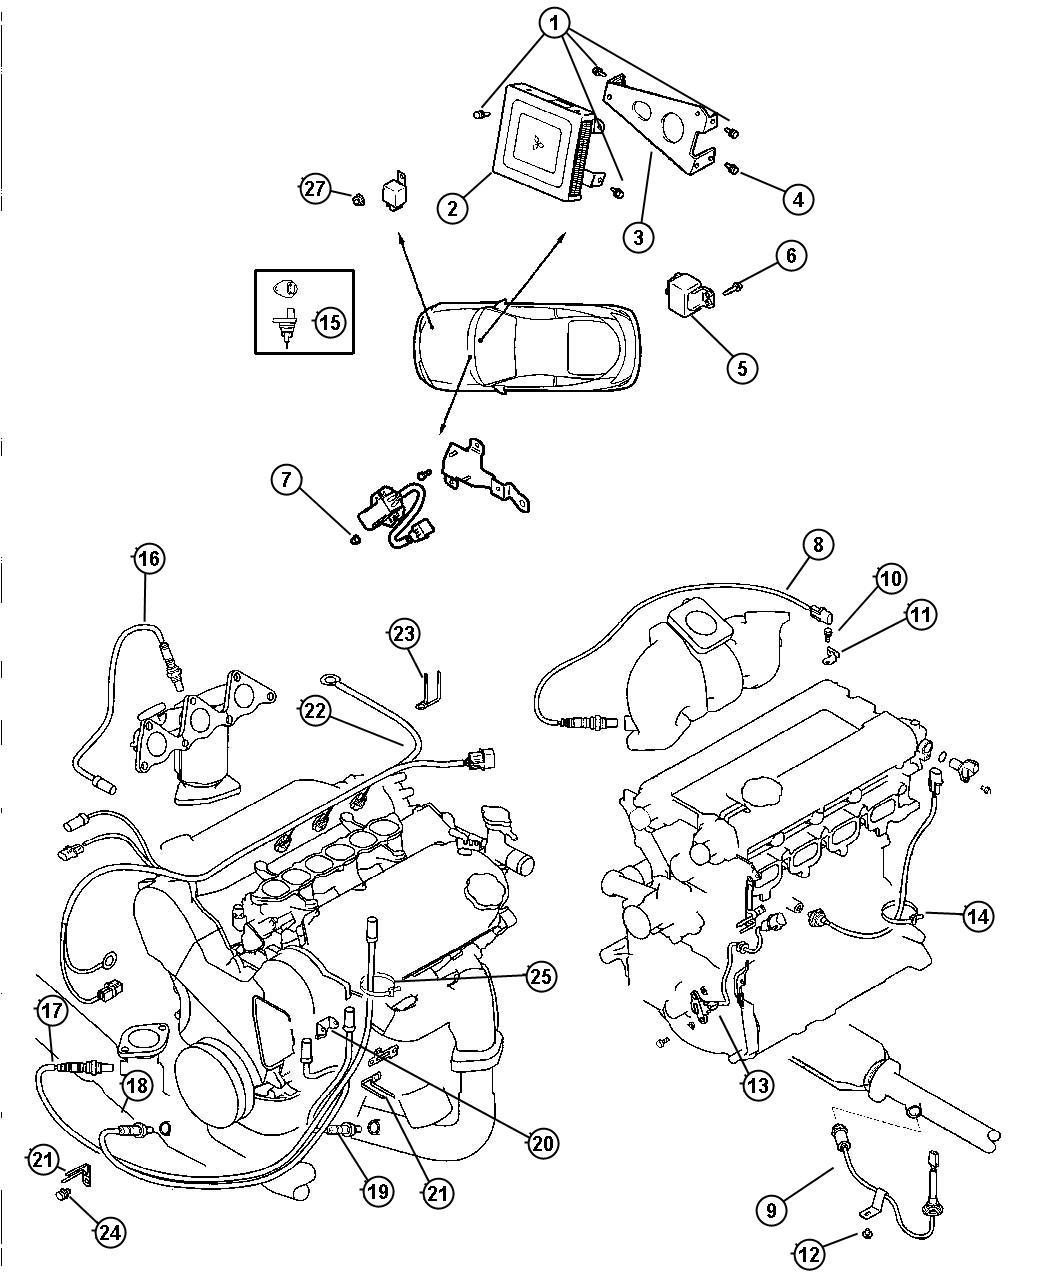 Dodge Dakota Wiring. Alternator. Relayssensorscontrol